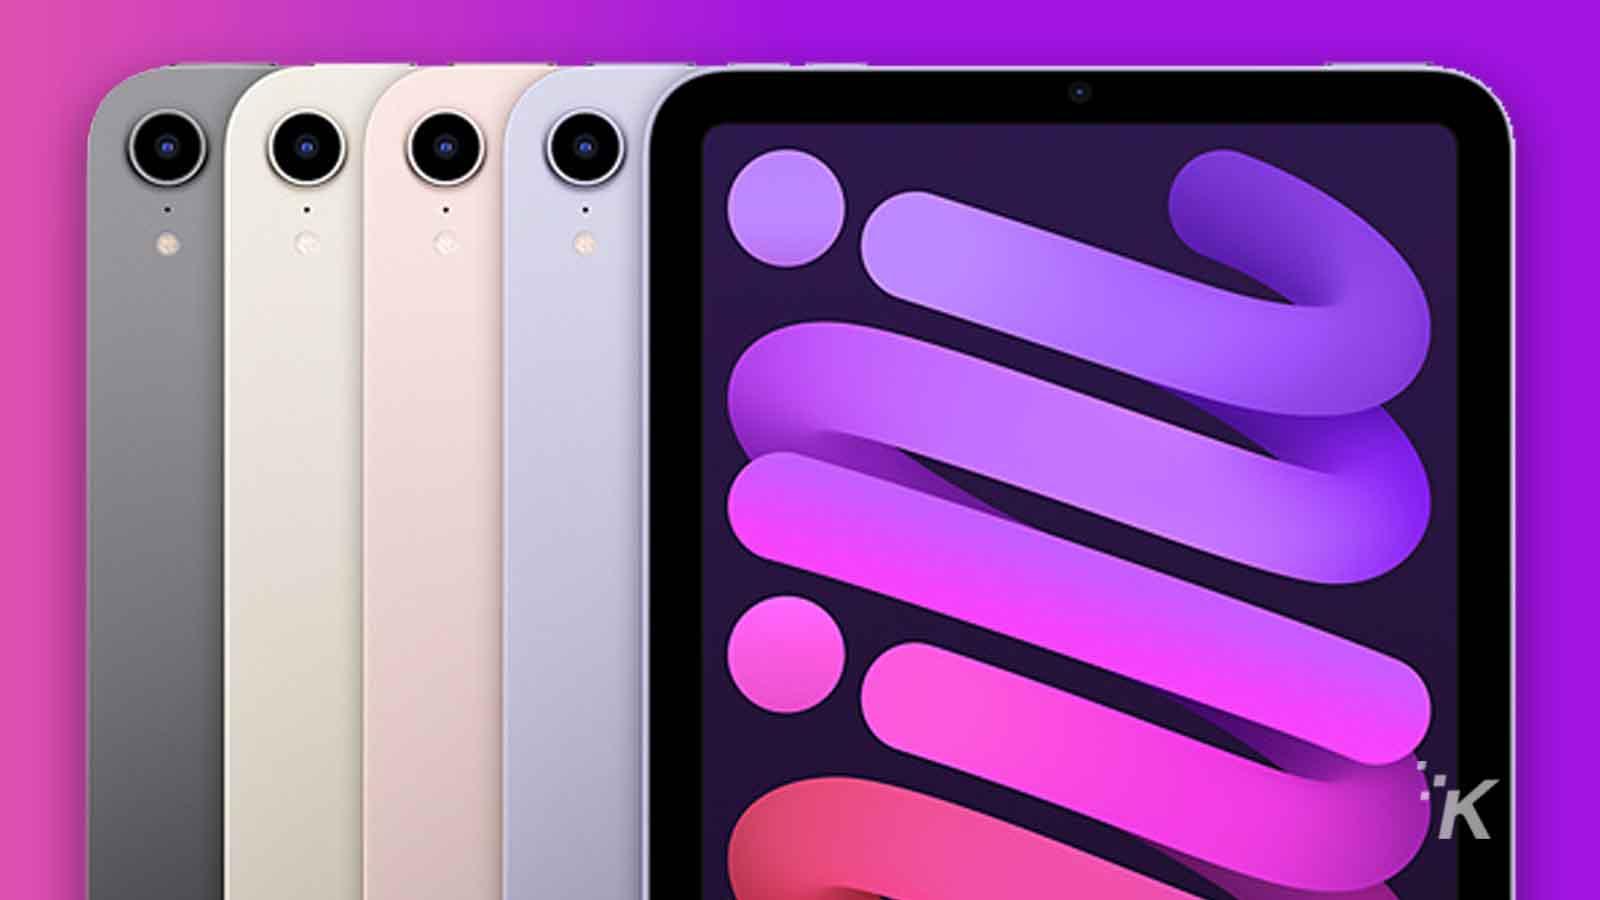 apple ipad mini in four colors